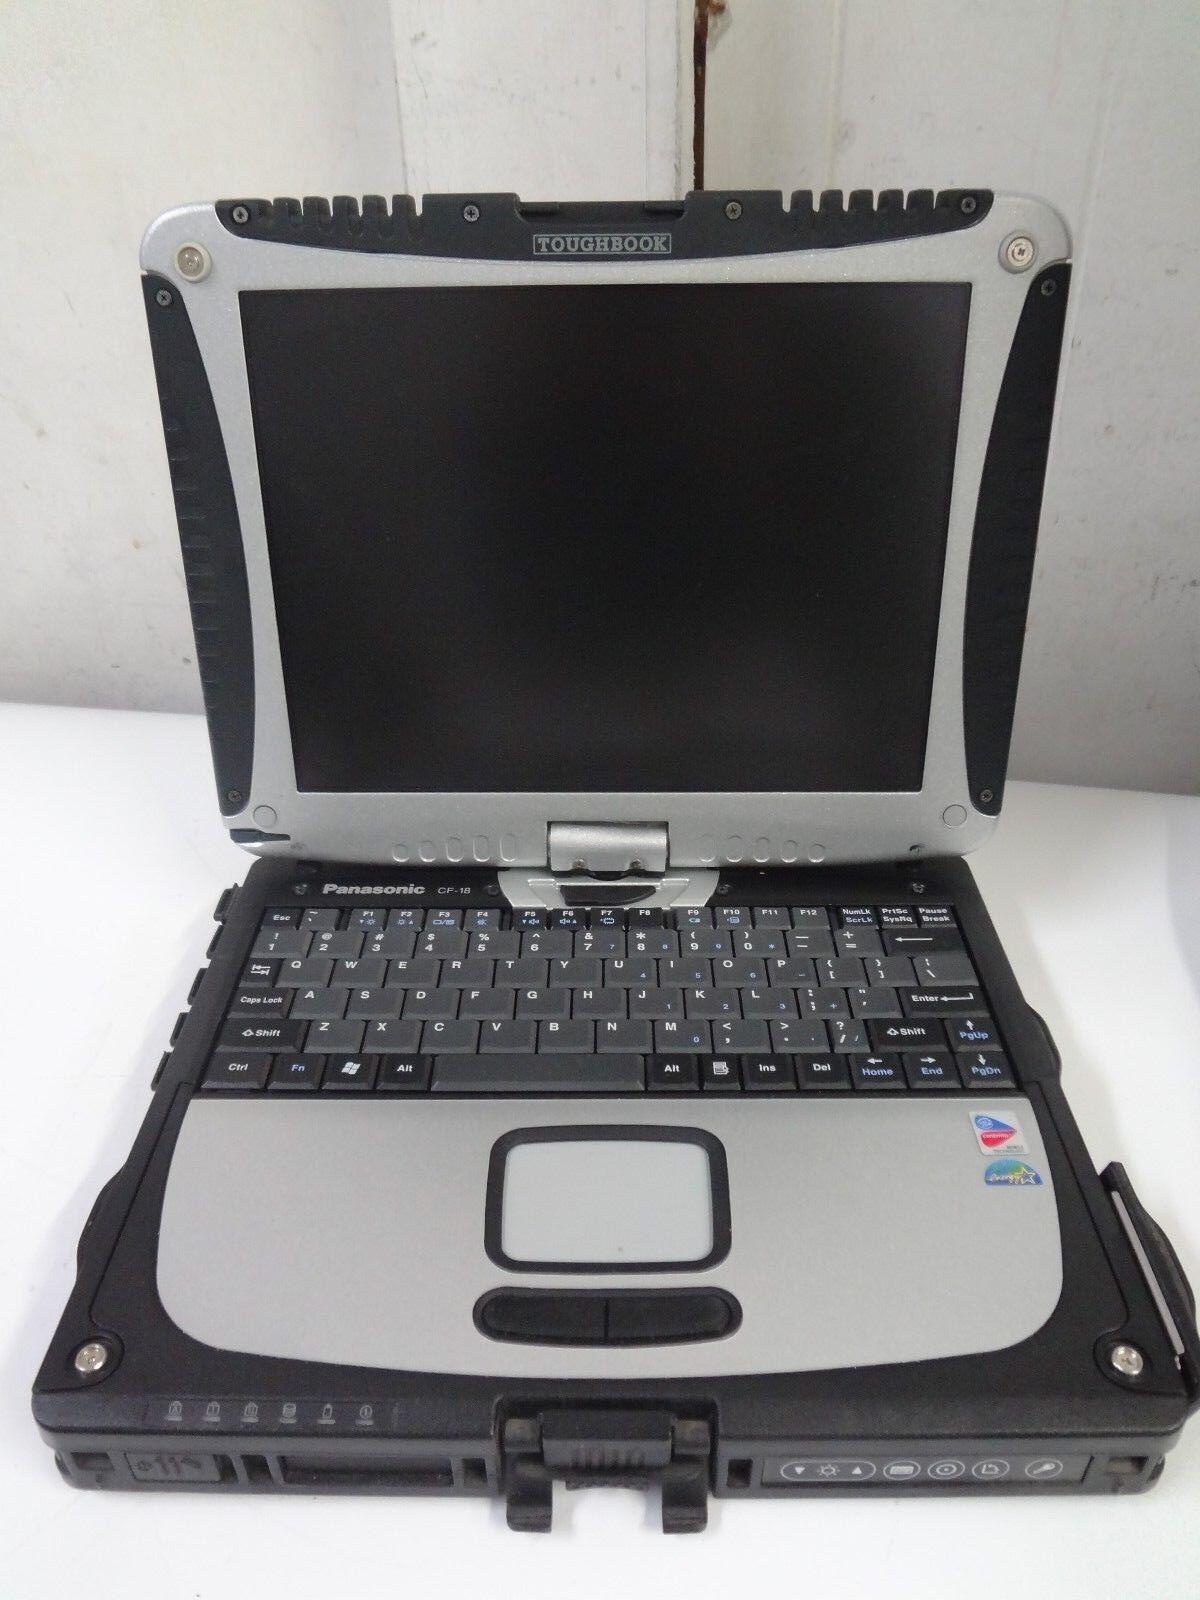 "Panasonic Toughbook CF-18 Intel Pentium M 900MHz 1.256MB  Ram ""NO HDD"" Laptop"